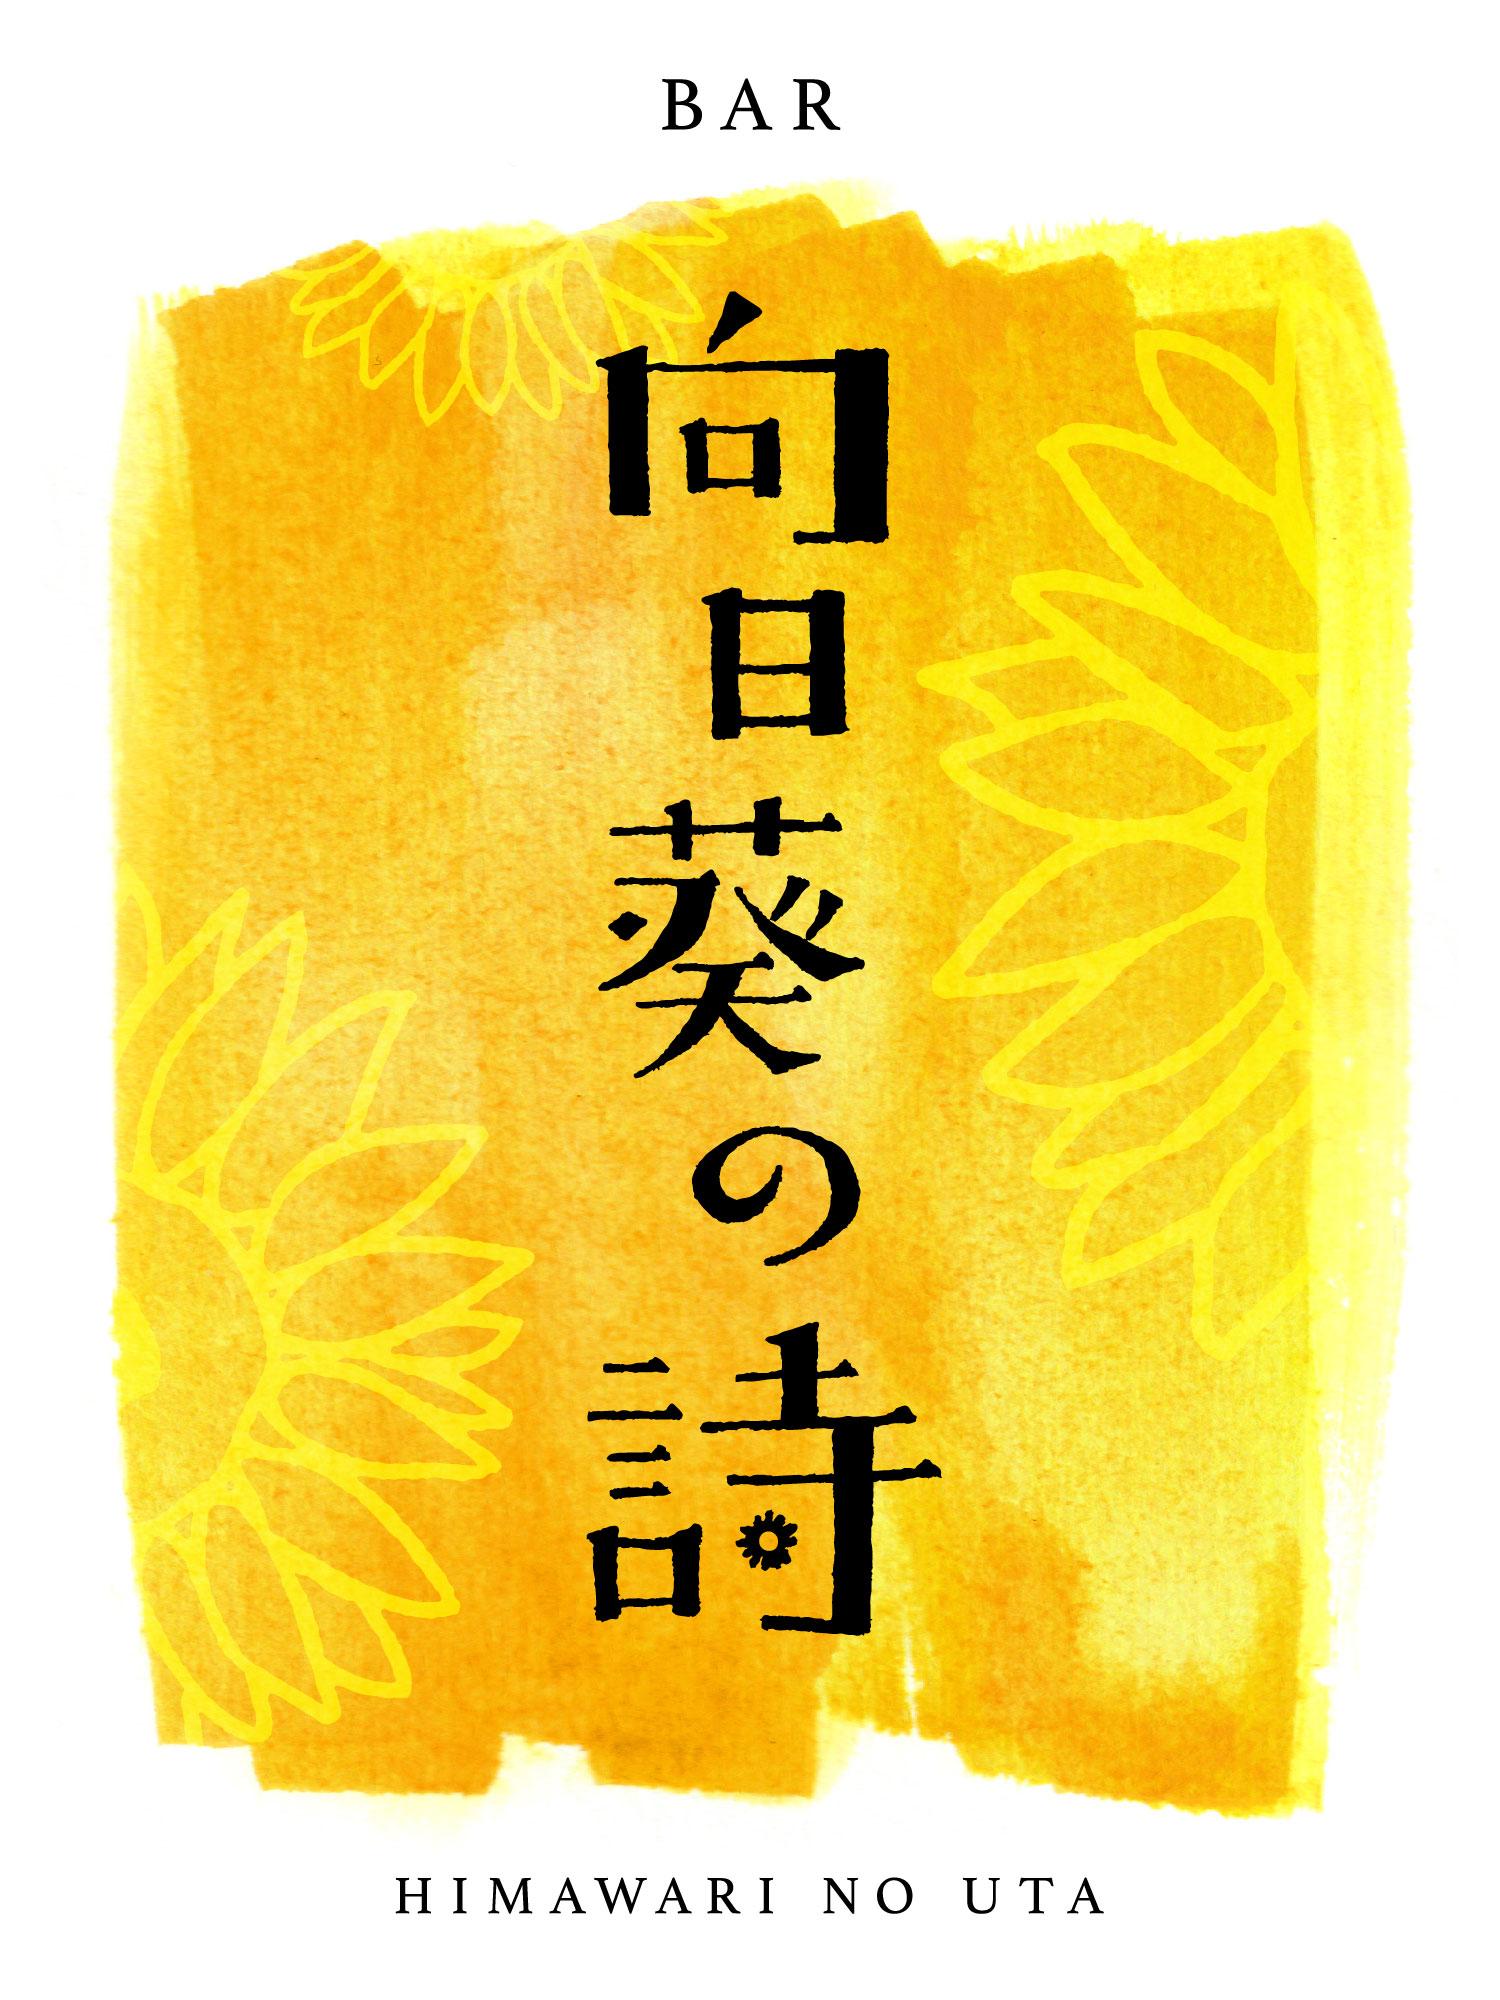 BAR 向日葵の詩 ロゴデザイン